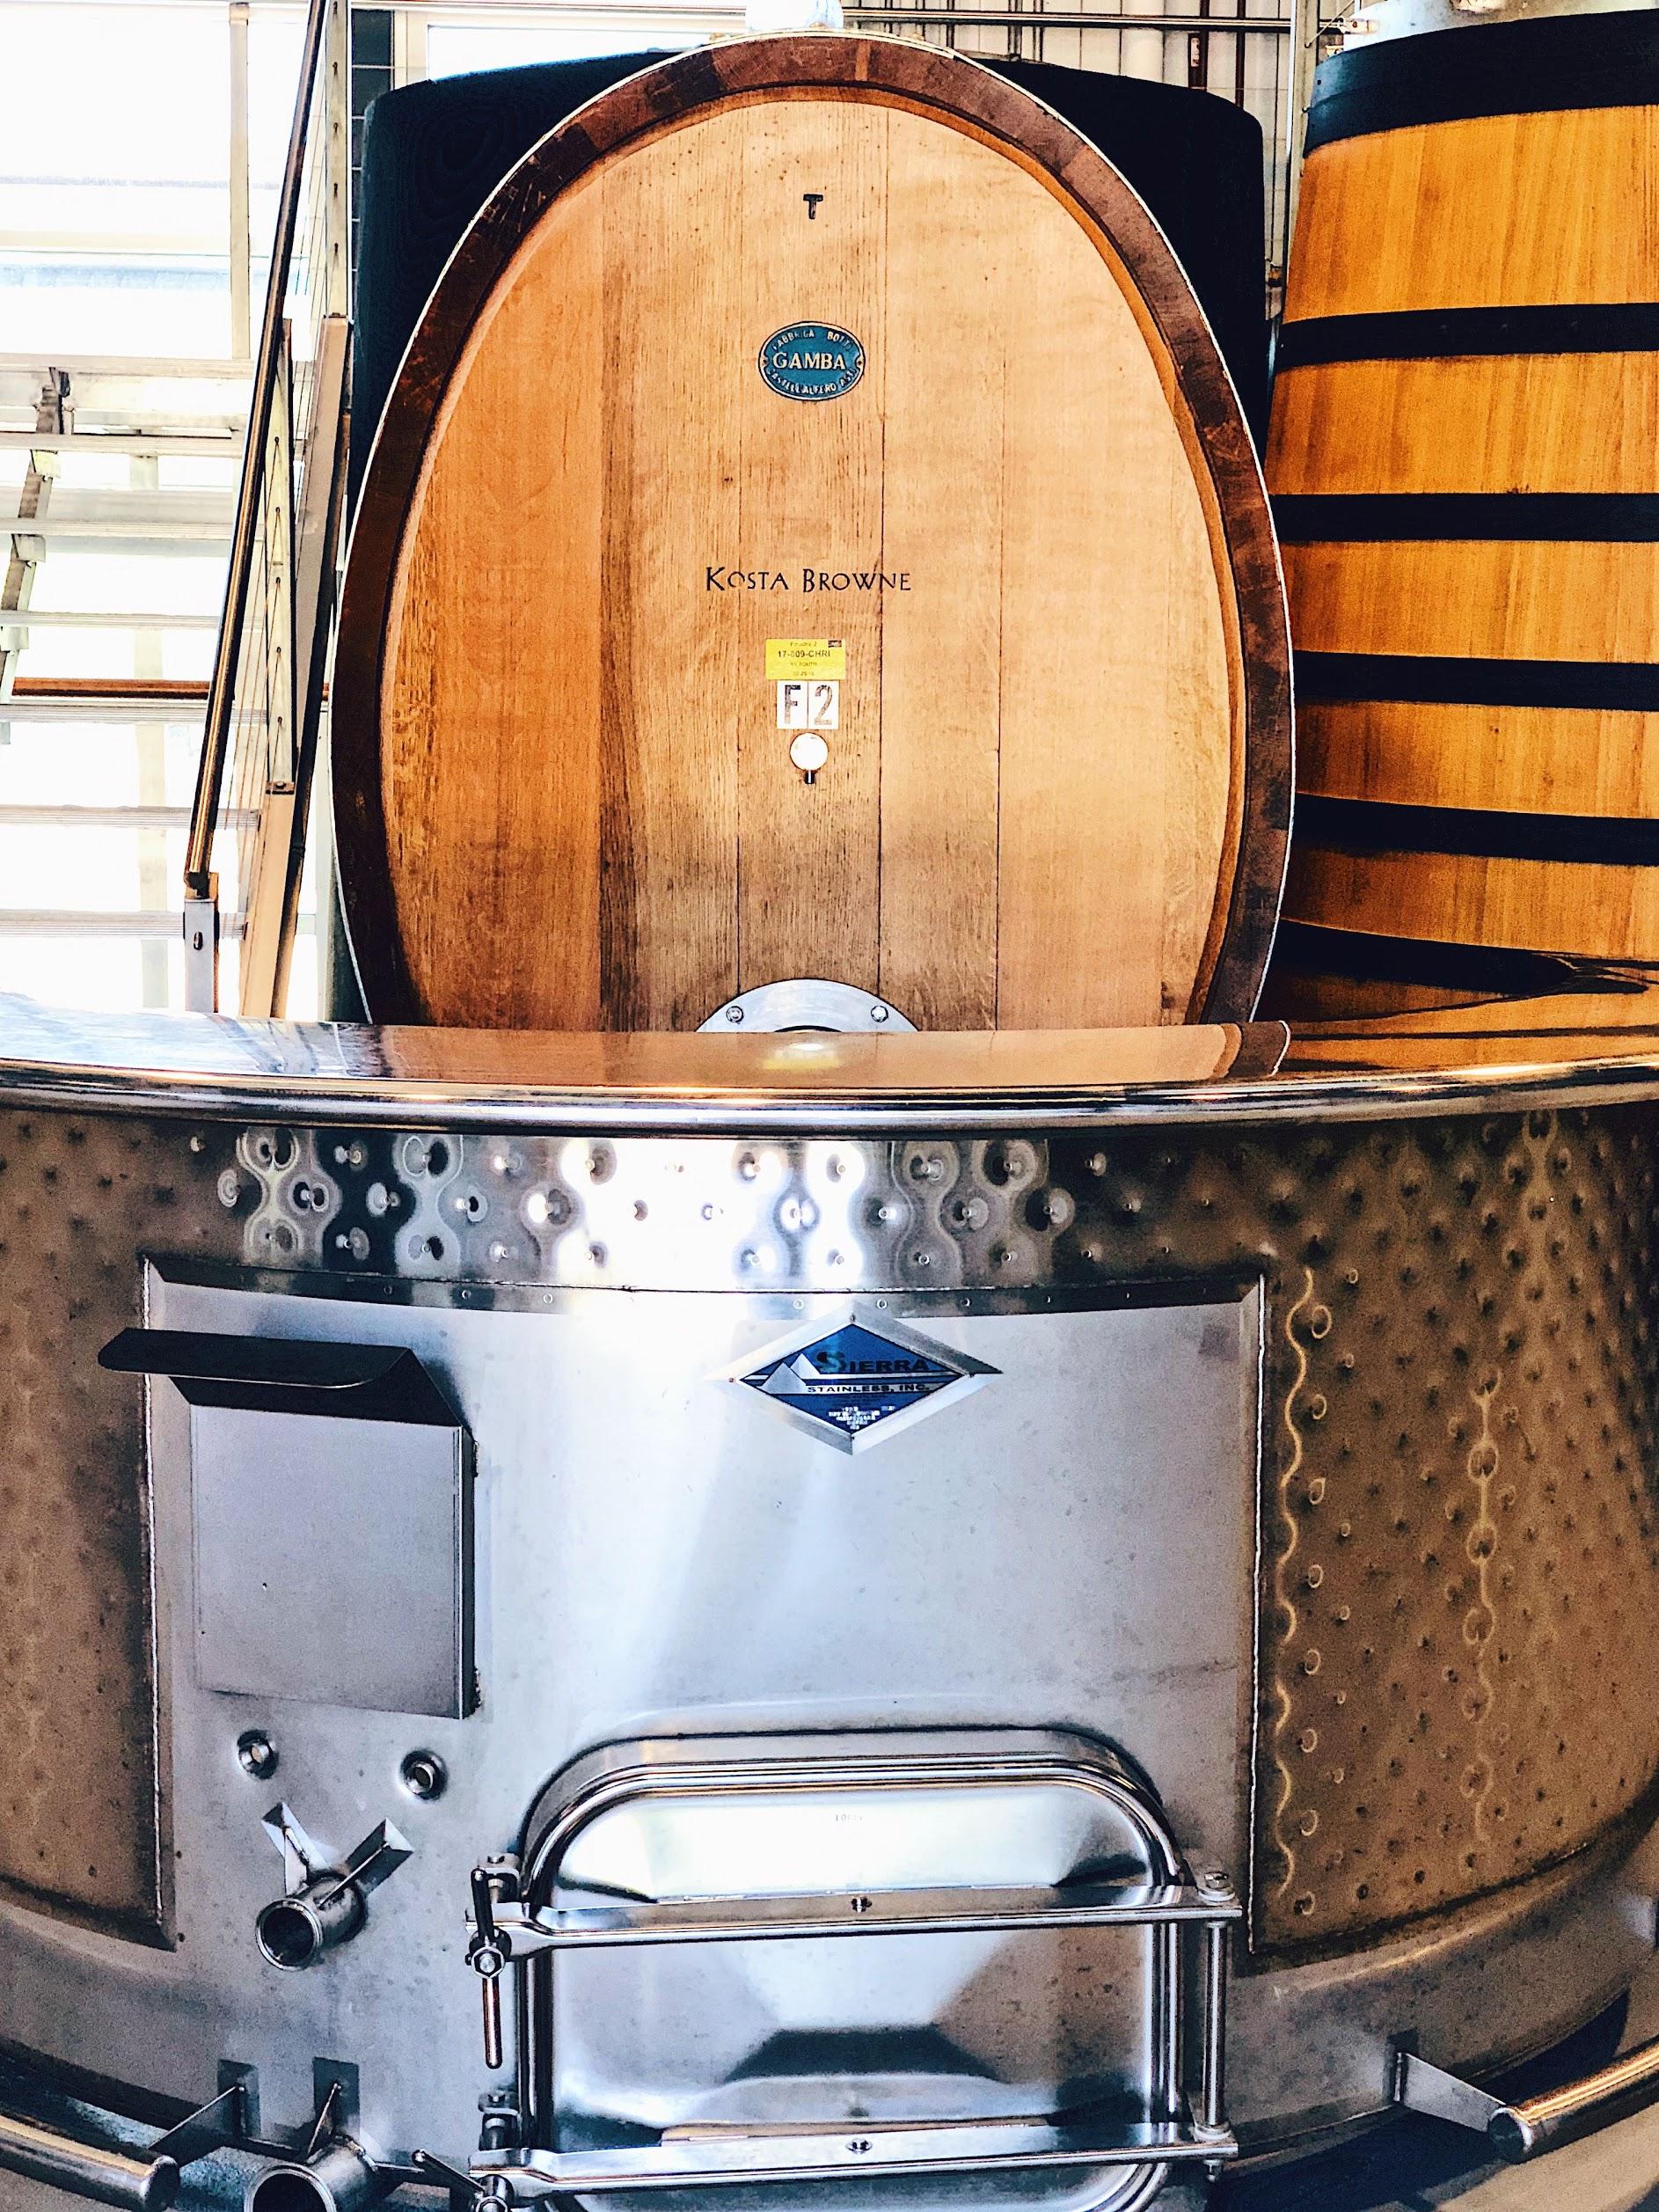 Kosta Browne Wine Barrels